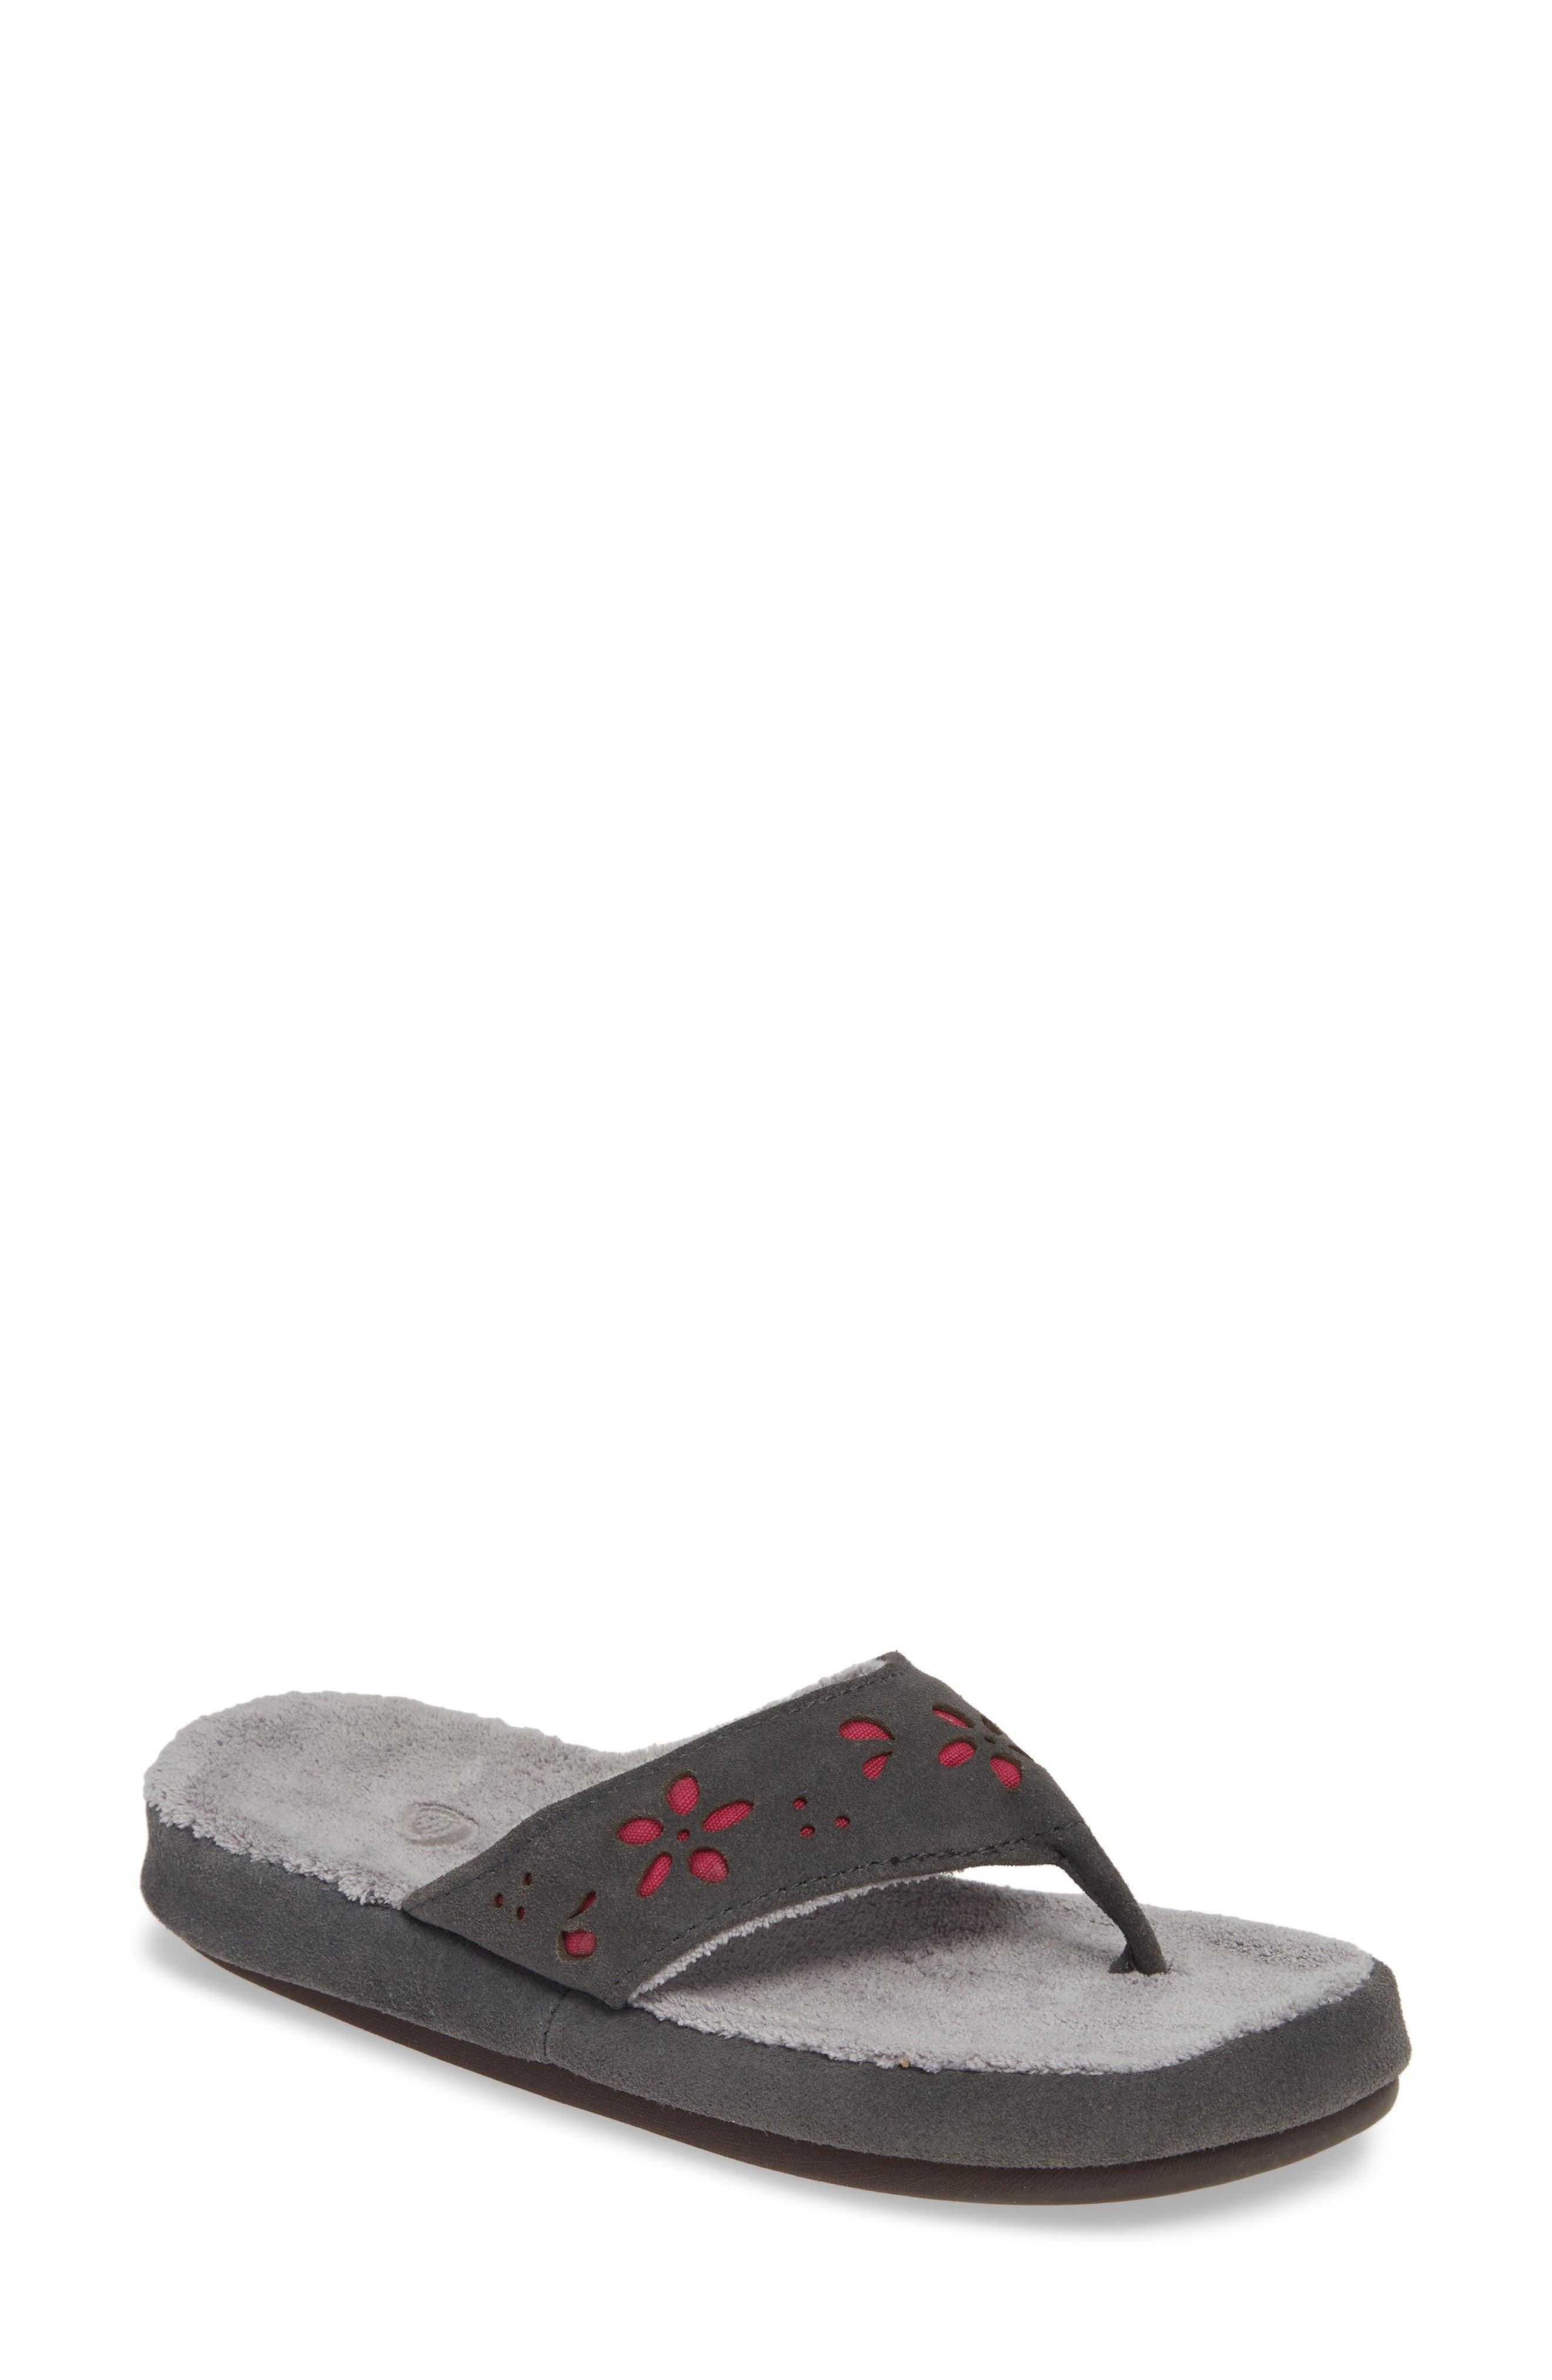 Acorn Flora Spa Flip Flop, Grey